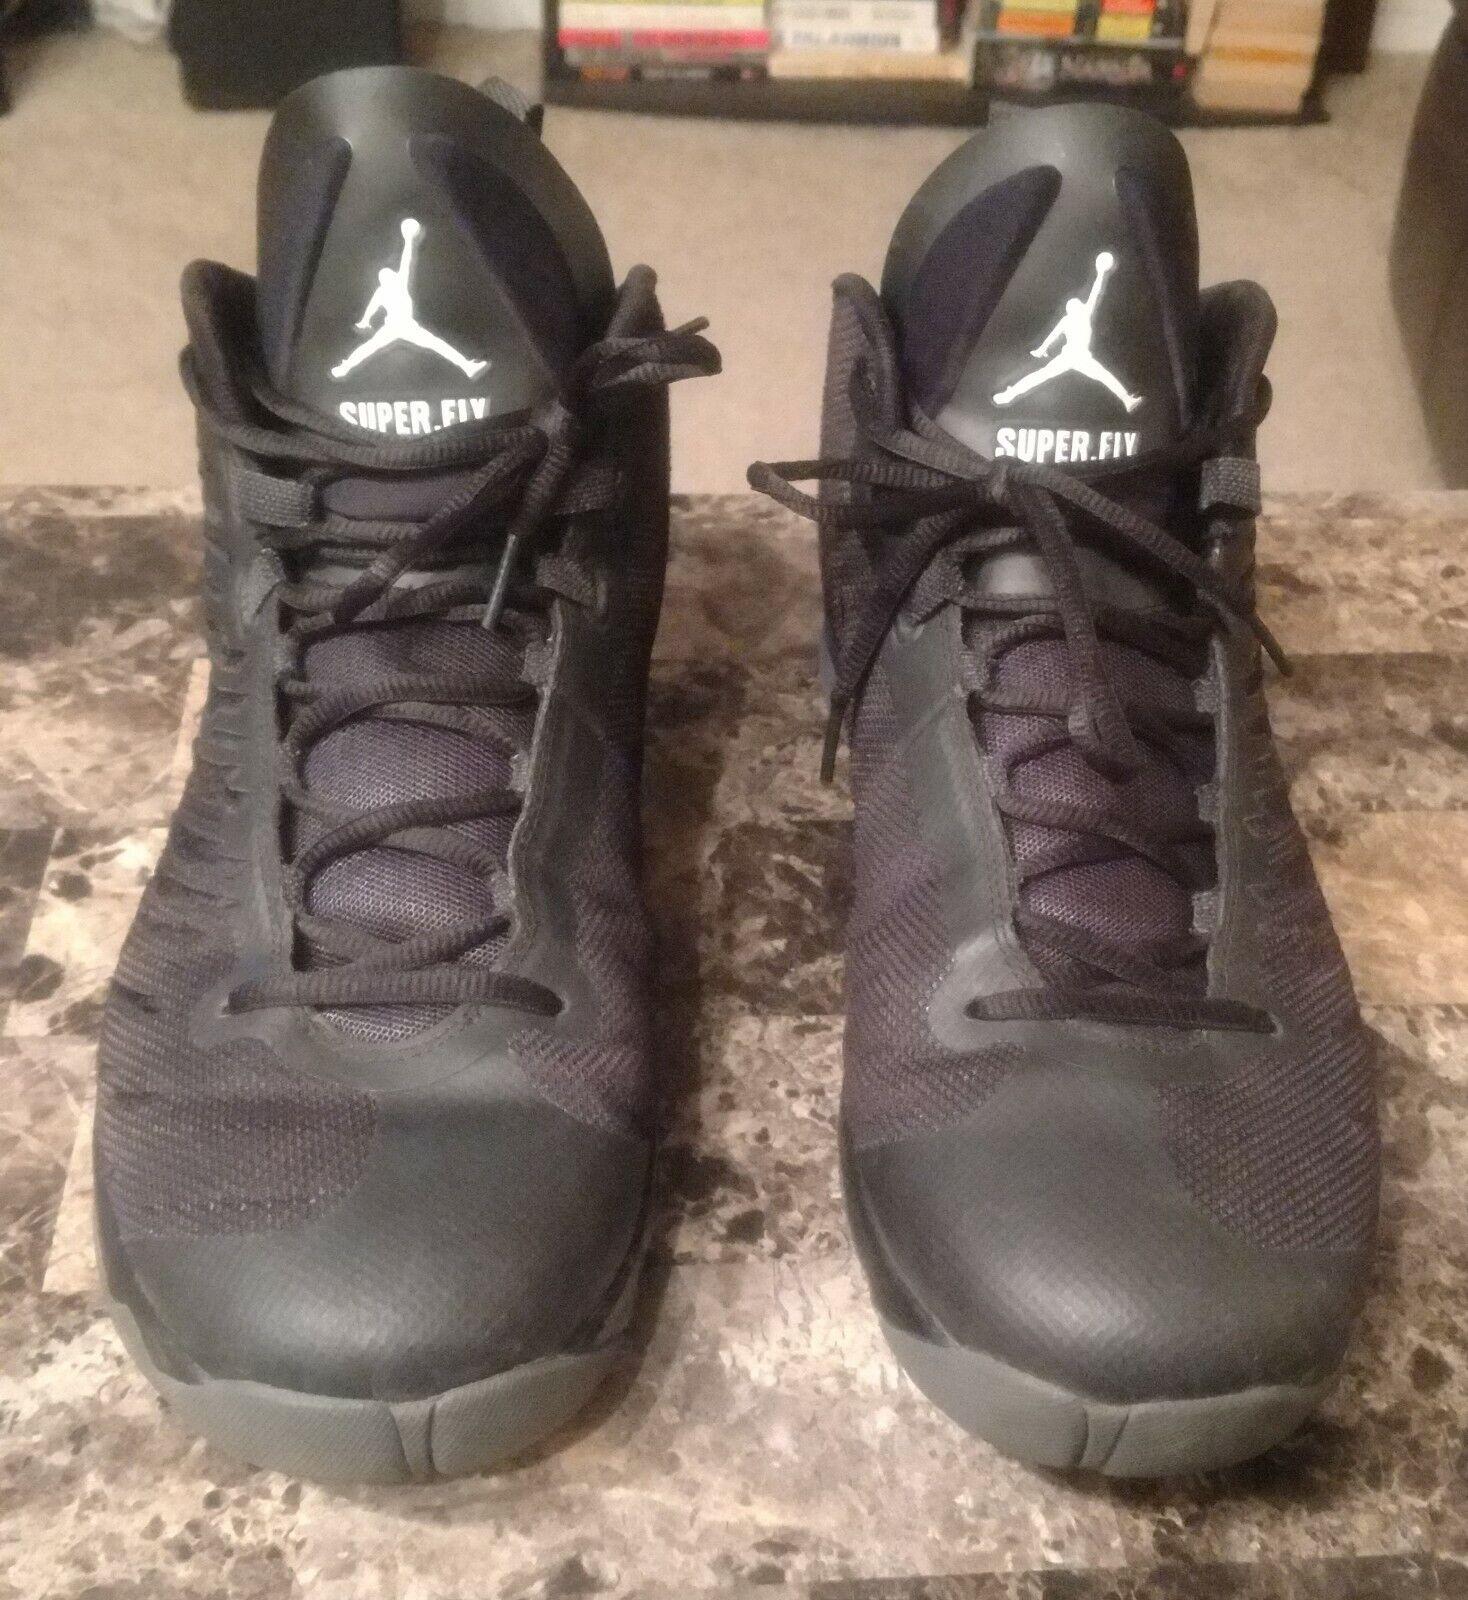 Surrounded listen Rose  Jordan Super.fly 5 Black White 844691040 Basketball Athletic Shoes Sz 13 *  for sale online | eBay